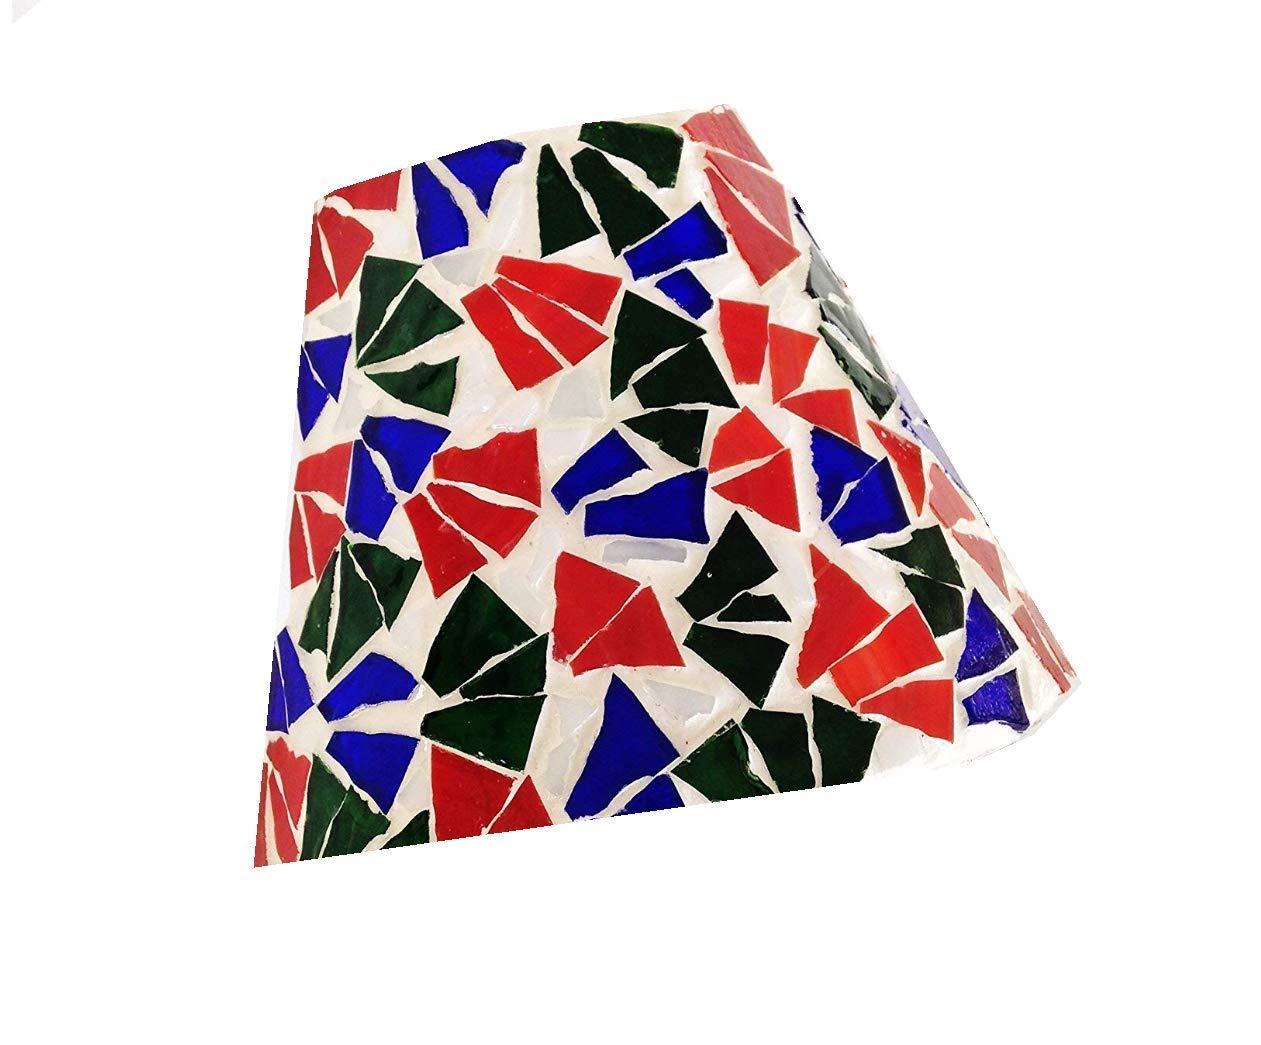 "5.5"" x 5 inch Mosaic Night Light Shade Red, Blue, Green"